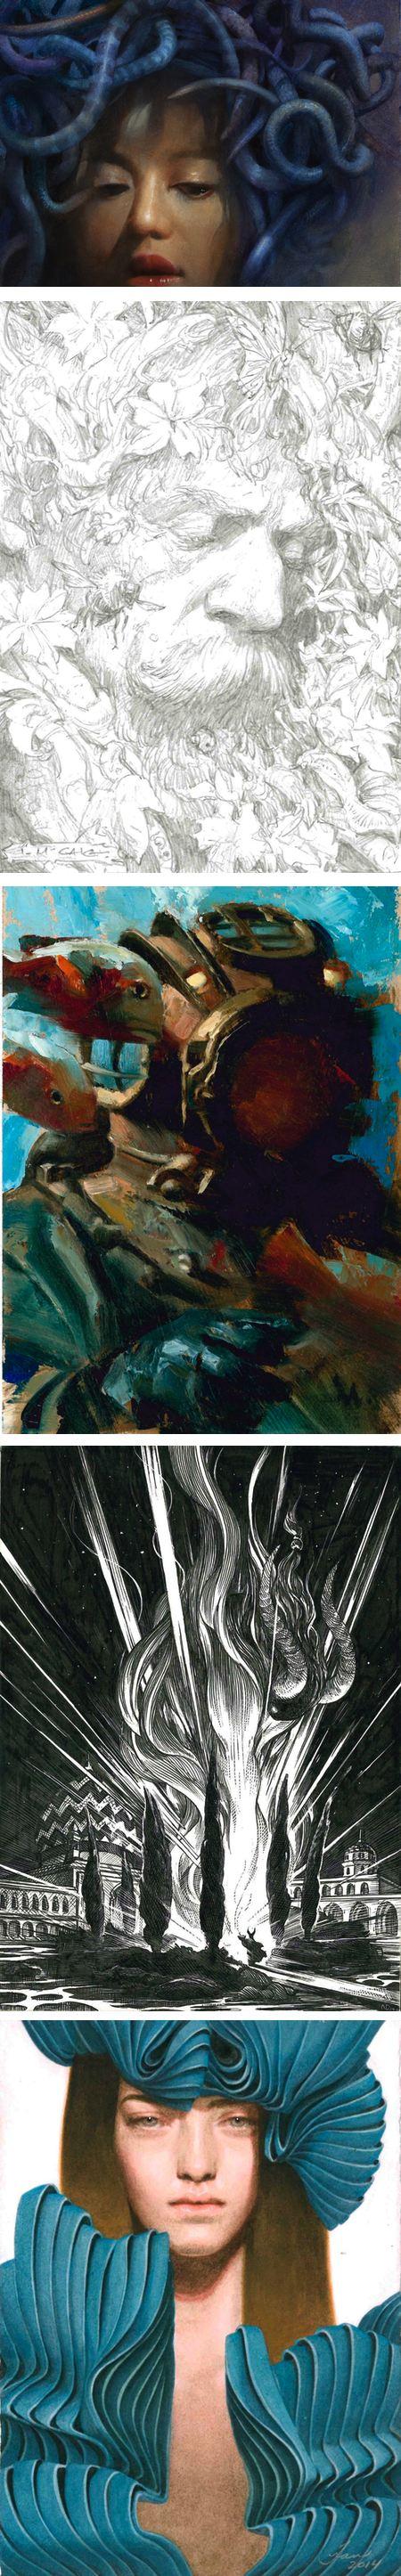 MicroVisions 2014: Robert Hunt, Iain McCaig, Gregory Manchess, Nicolas Delort, Tran Nguyen